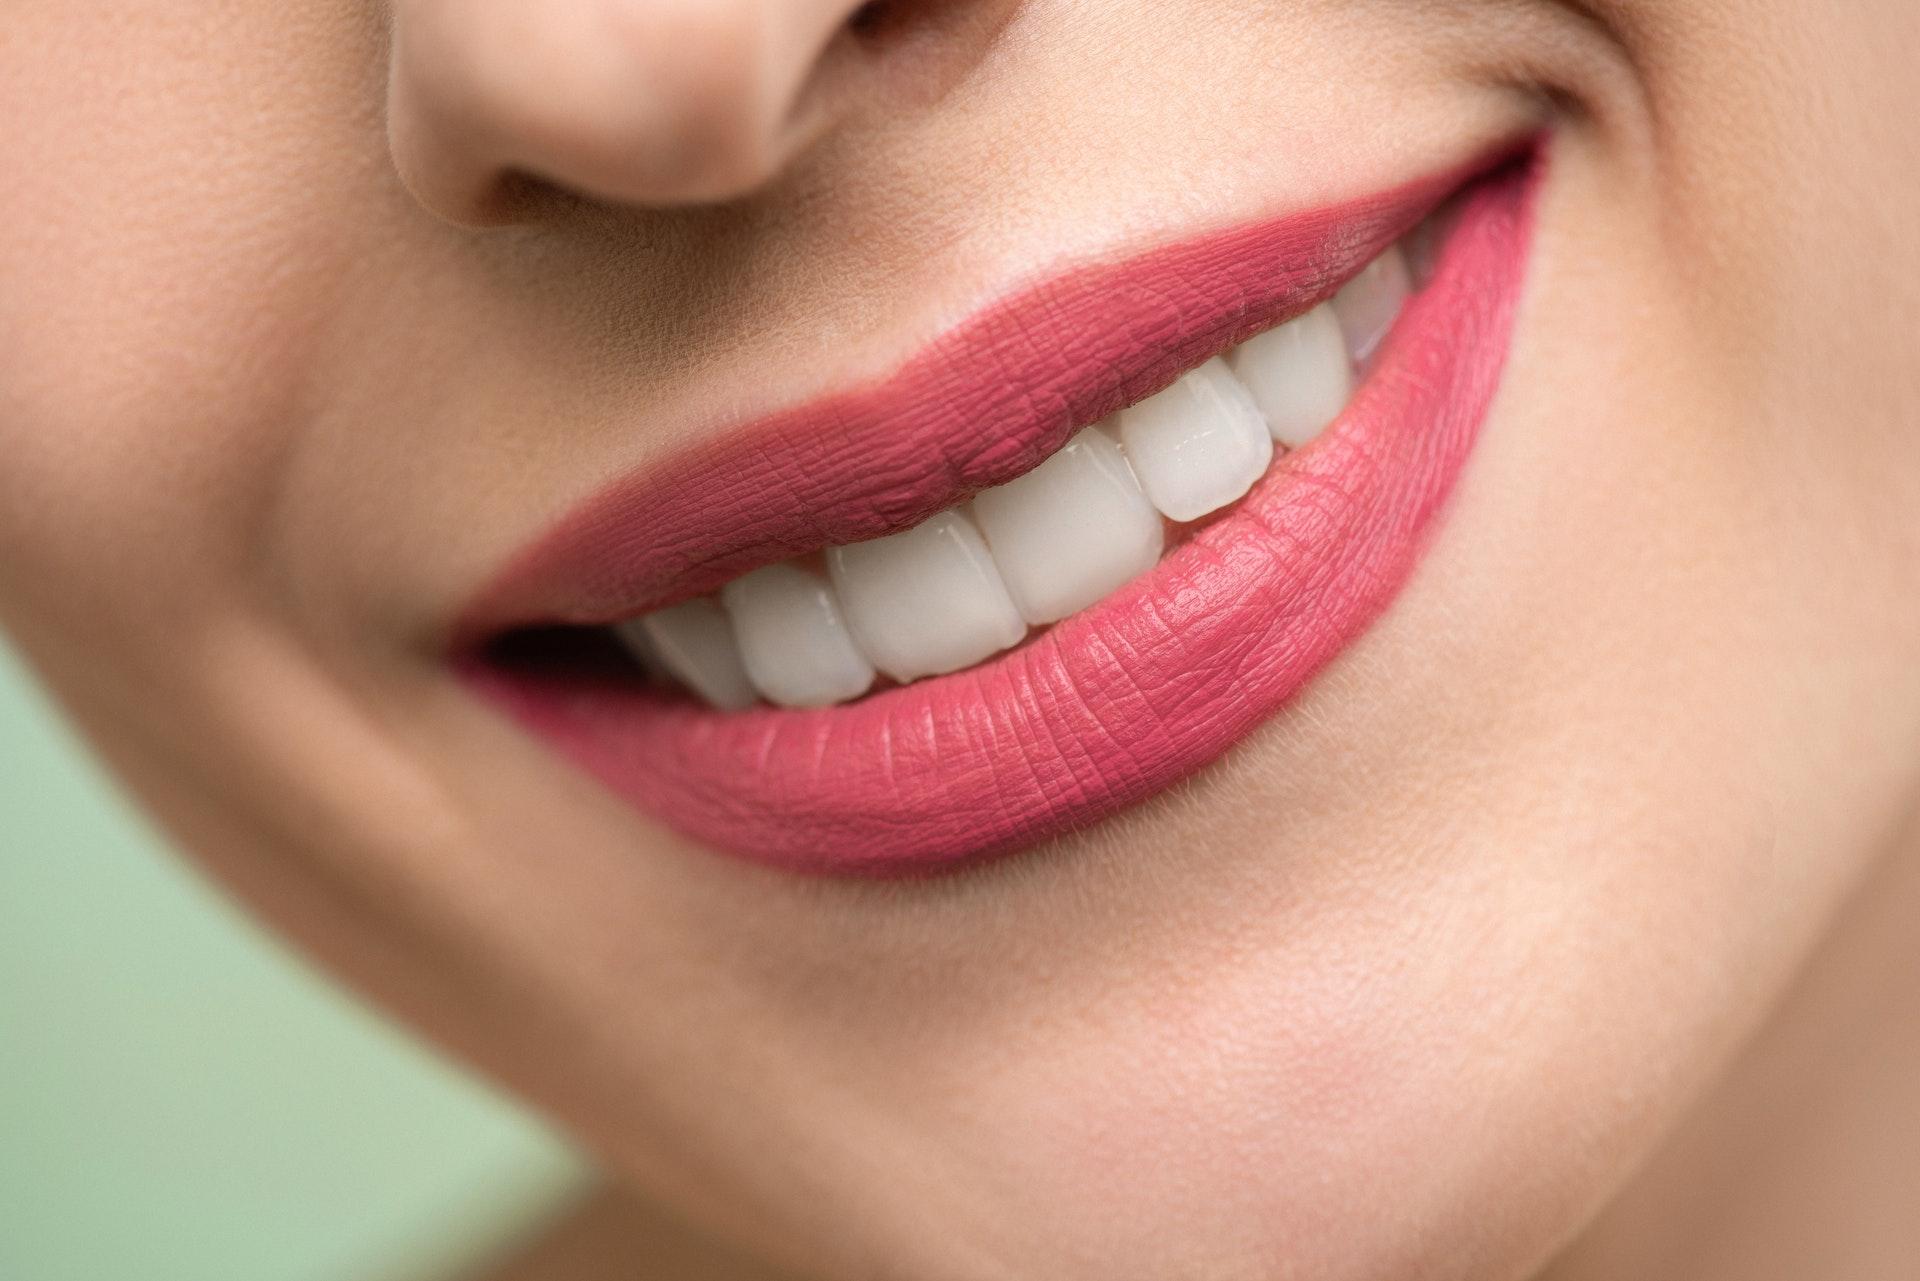 professional_teeth_whitening_Georgia